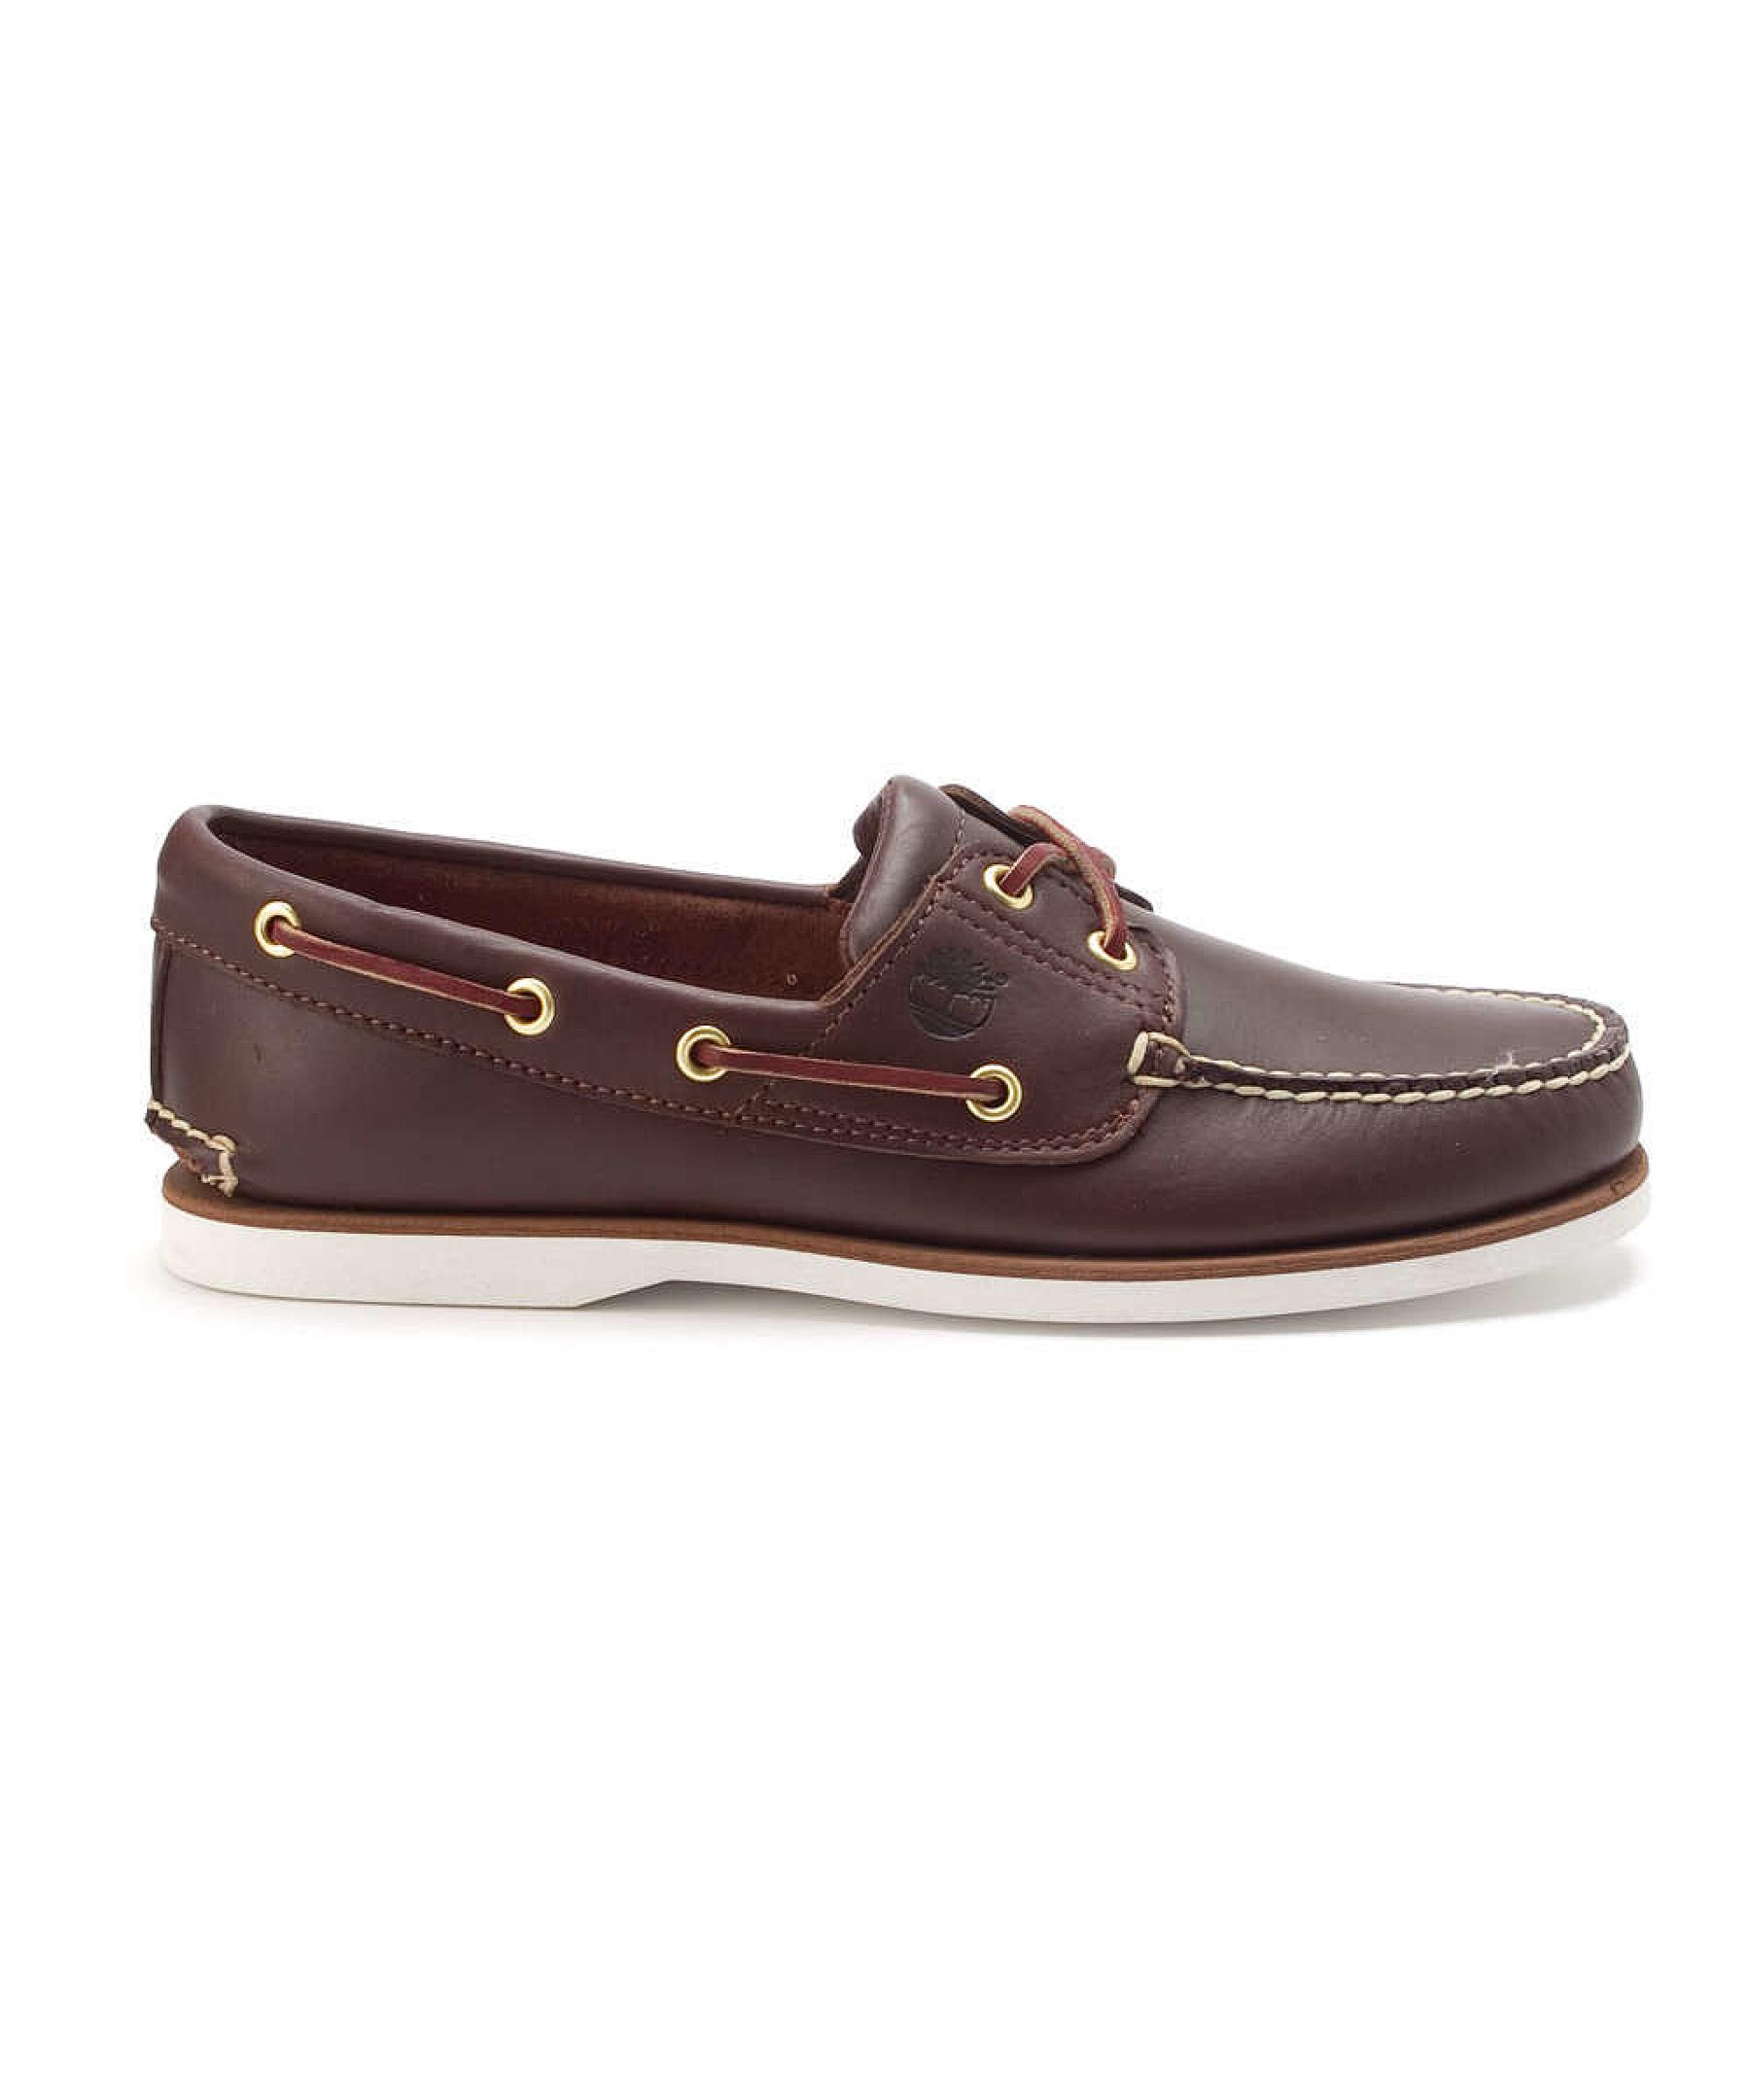 Timberland Menu0026#39;s U00c2u00ae Icon 2-eye Boat Athletic Boating Shoes In Brown For Men (rootbeer) | Lyst